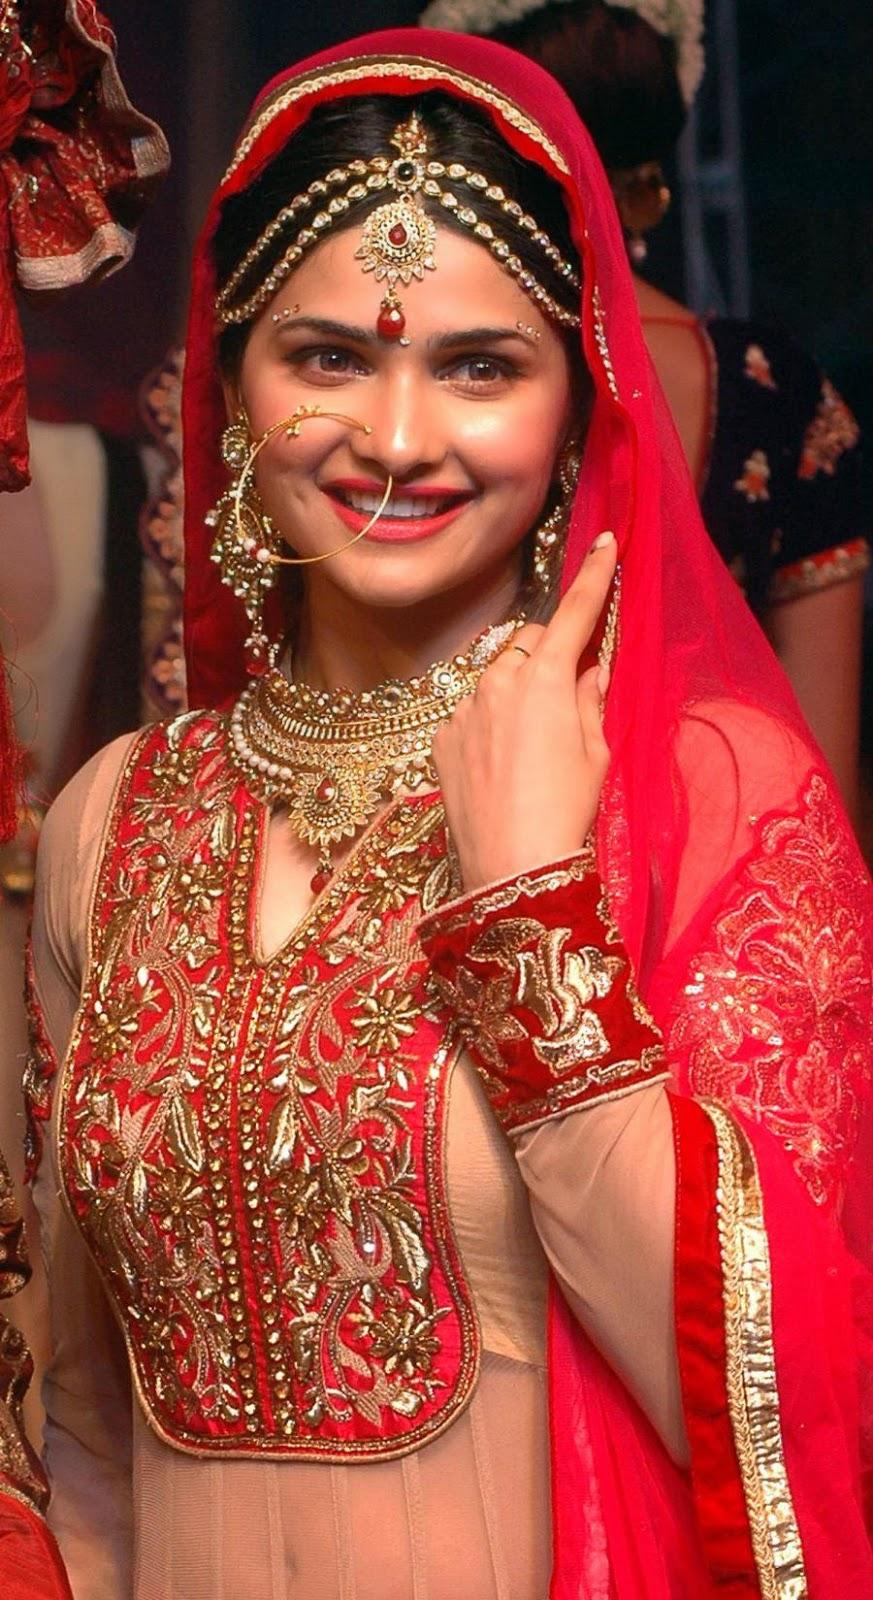 ... Suit at Fashion Show in Kolkata | Stylish Designer Sarees,Lehengas